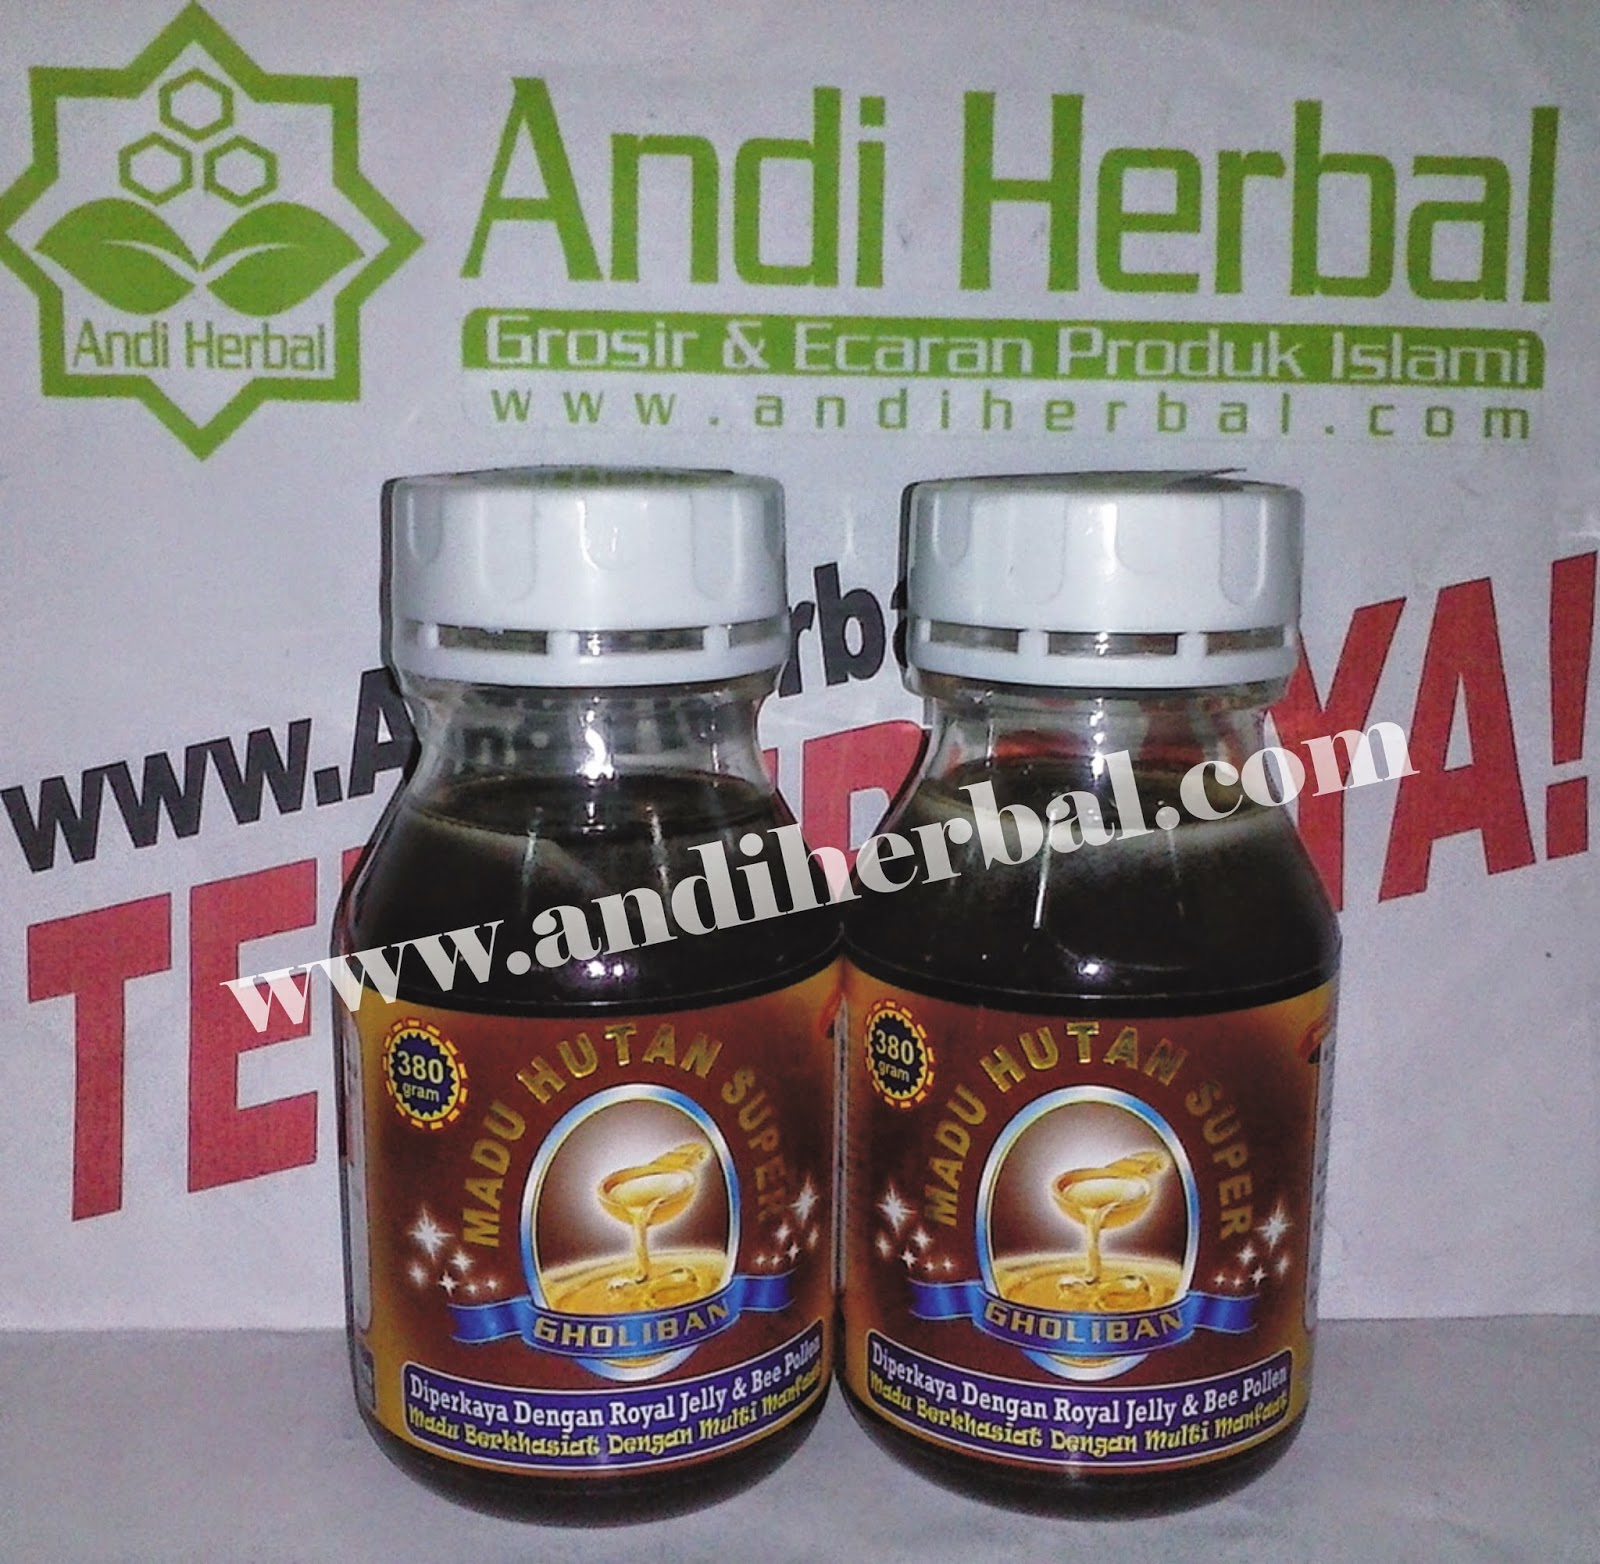 Madu Hutan Super Gholiban 350 gr Andiherbal.com